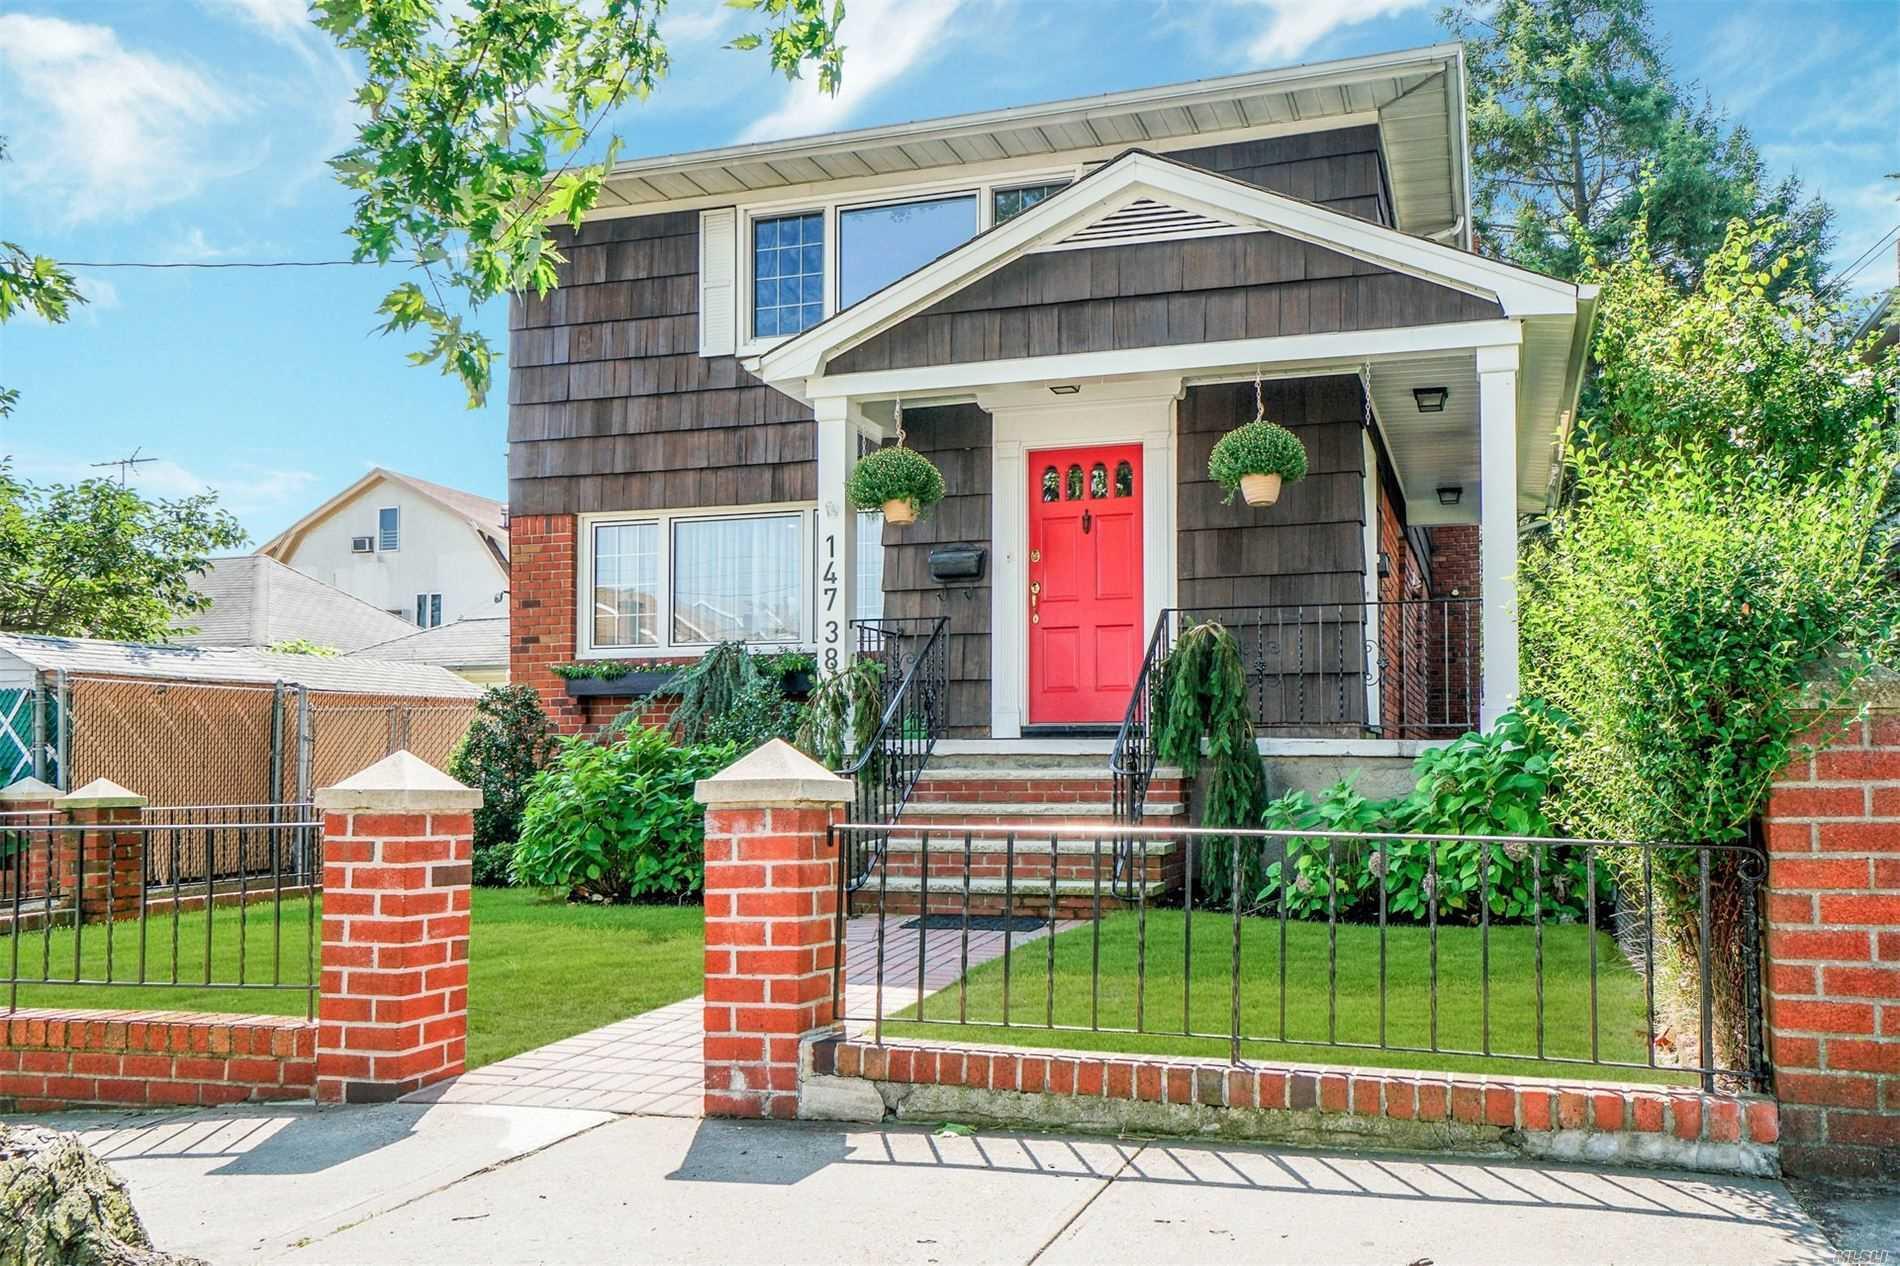 Property for sale at 147-38 22nd Avenue, Whitestone NY 11357, Whitestone,  New York 11357